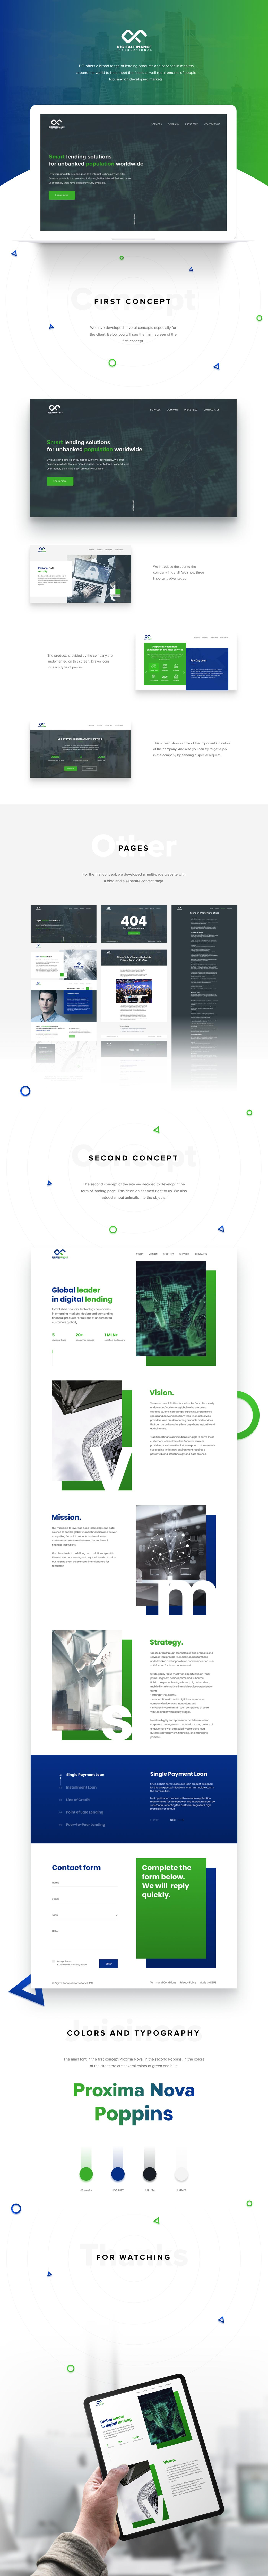 #Design #webdesign #uxdesign #UIDesign #interface #website #digitaldesign landing page finance UI